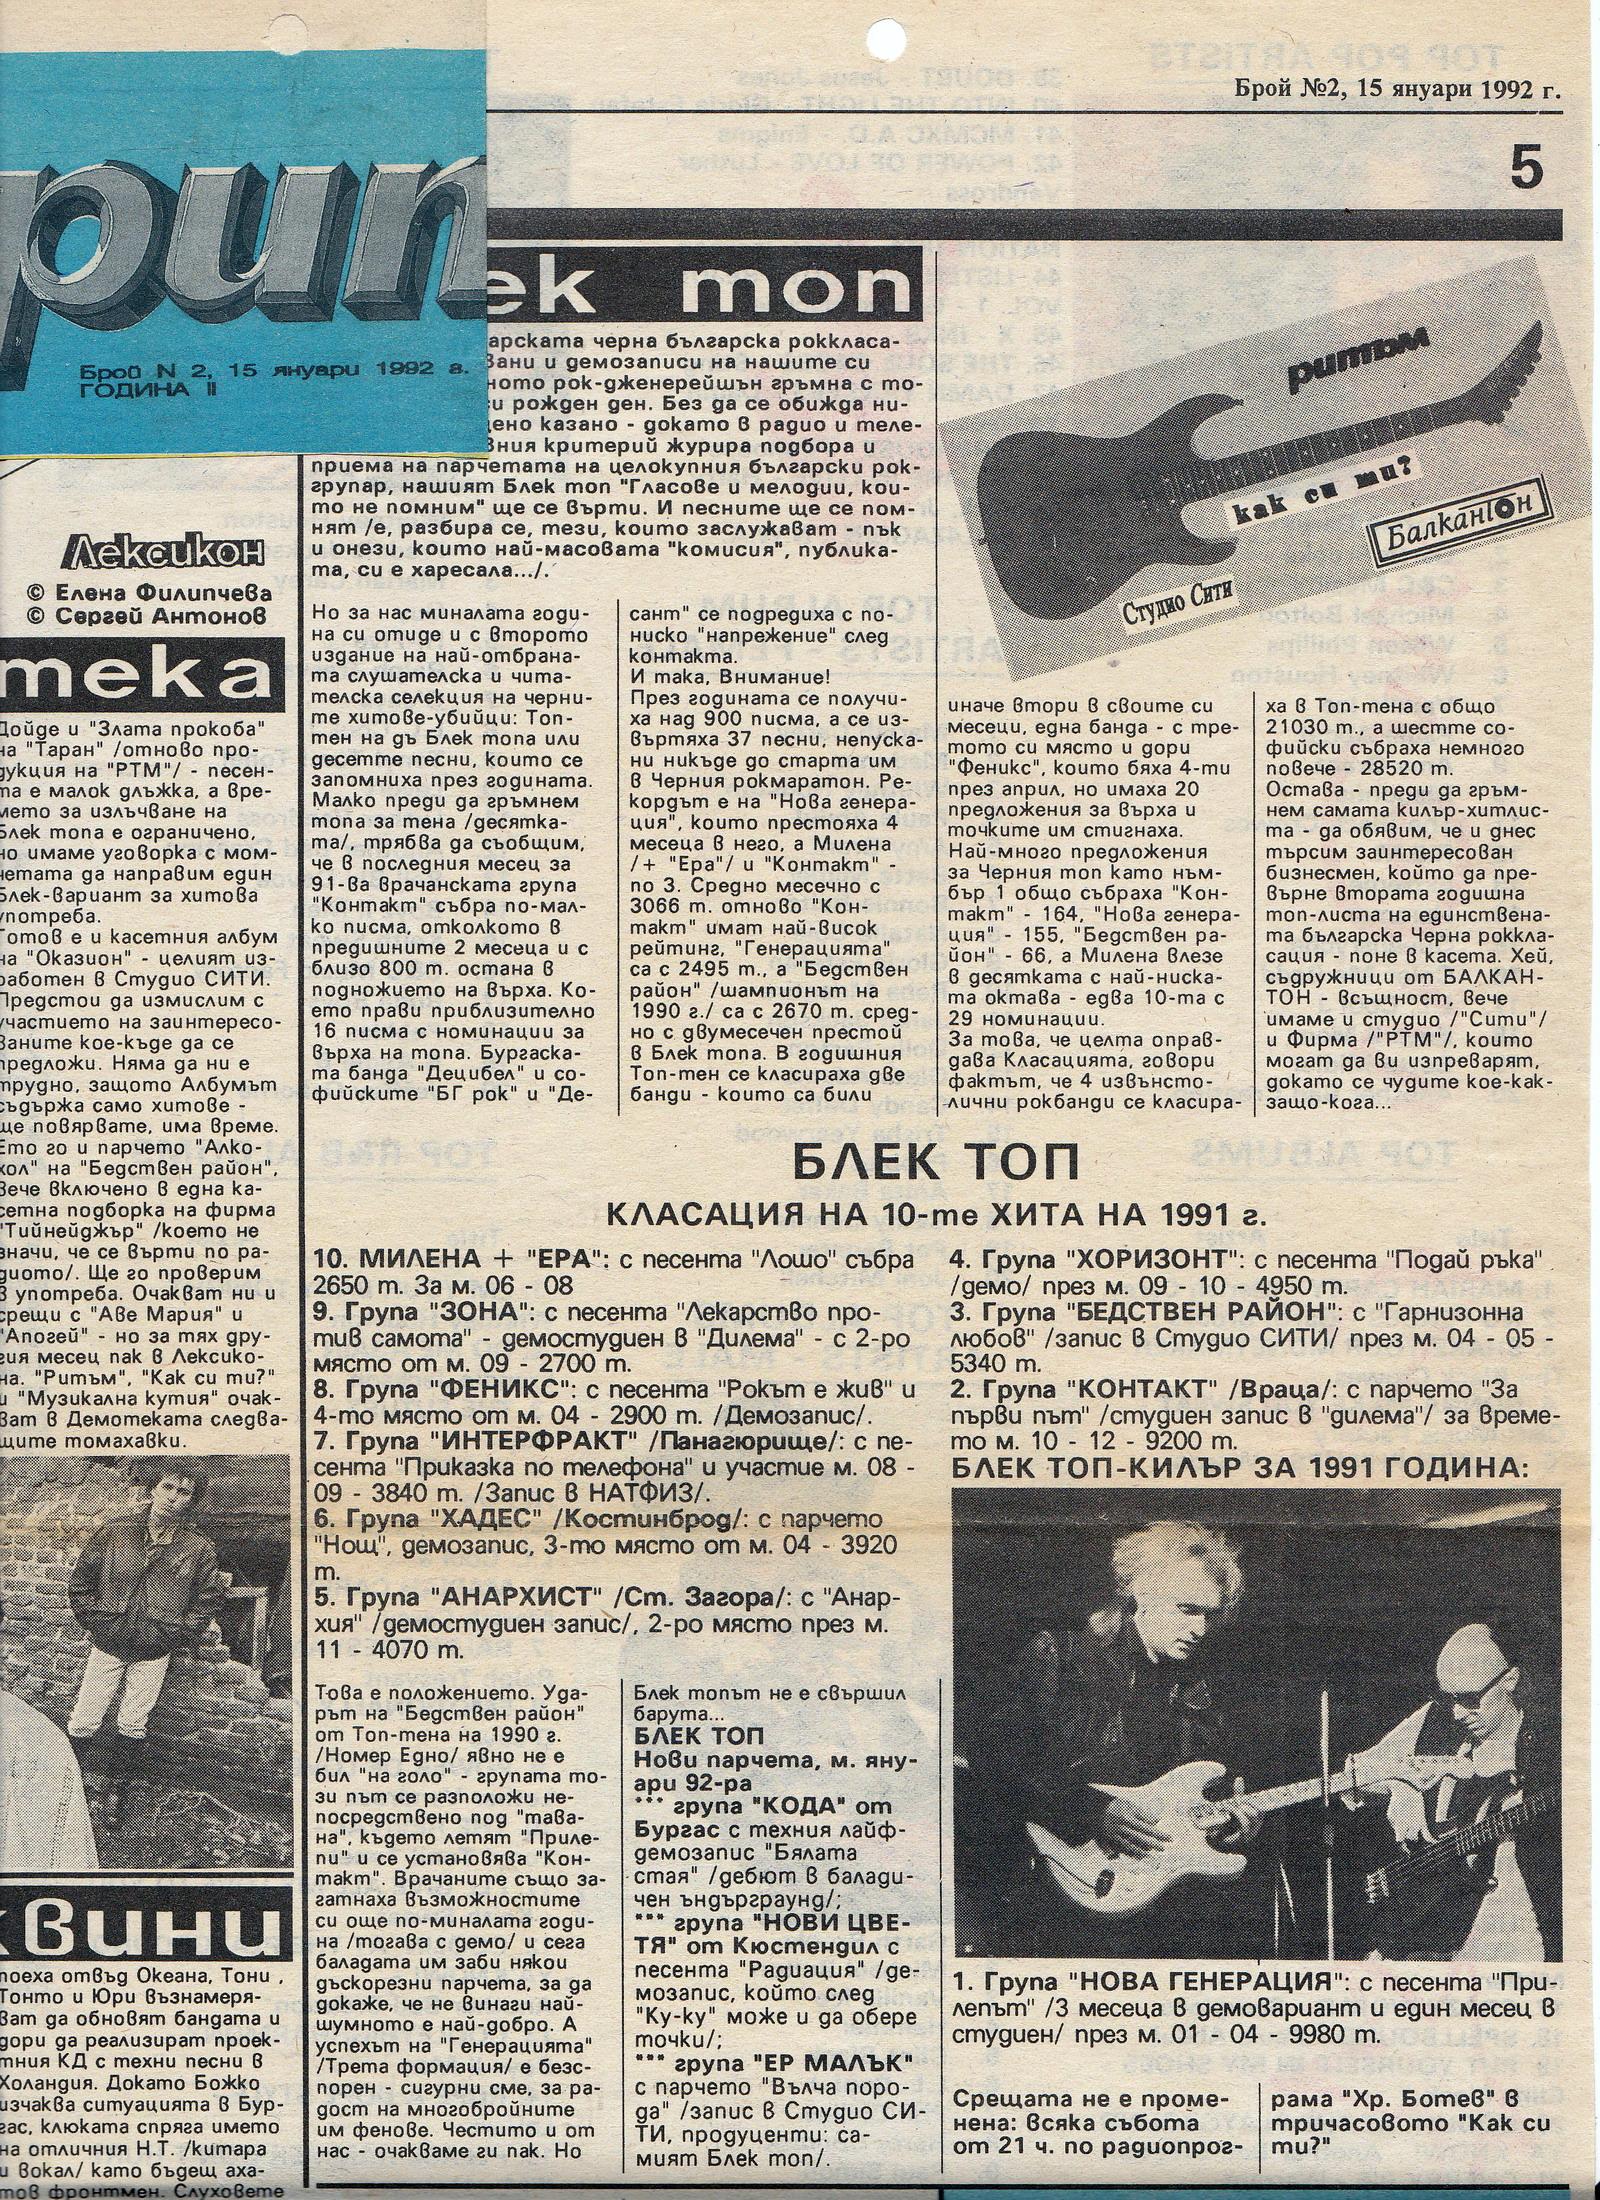 Блек Топ: Годишен Топ10/1991 (